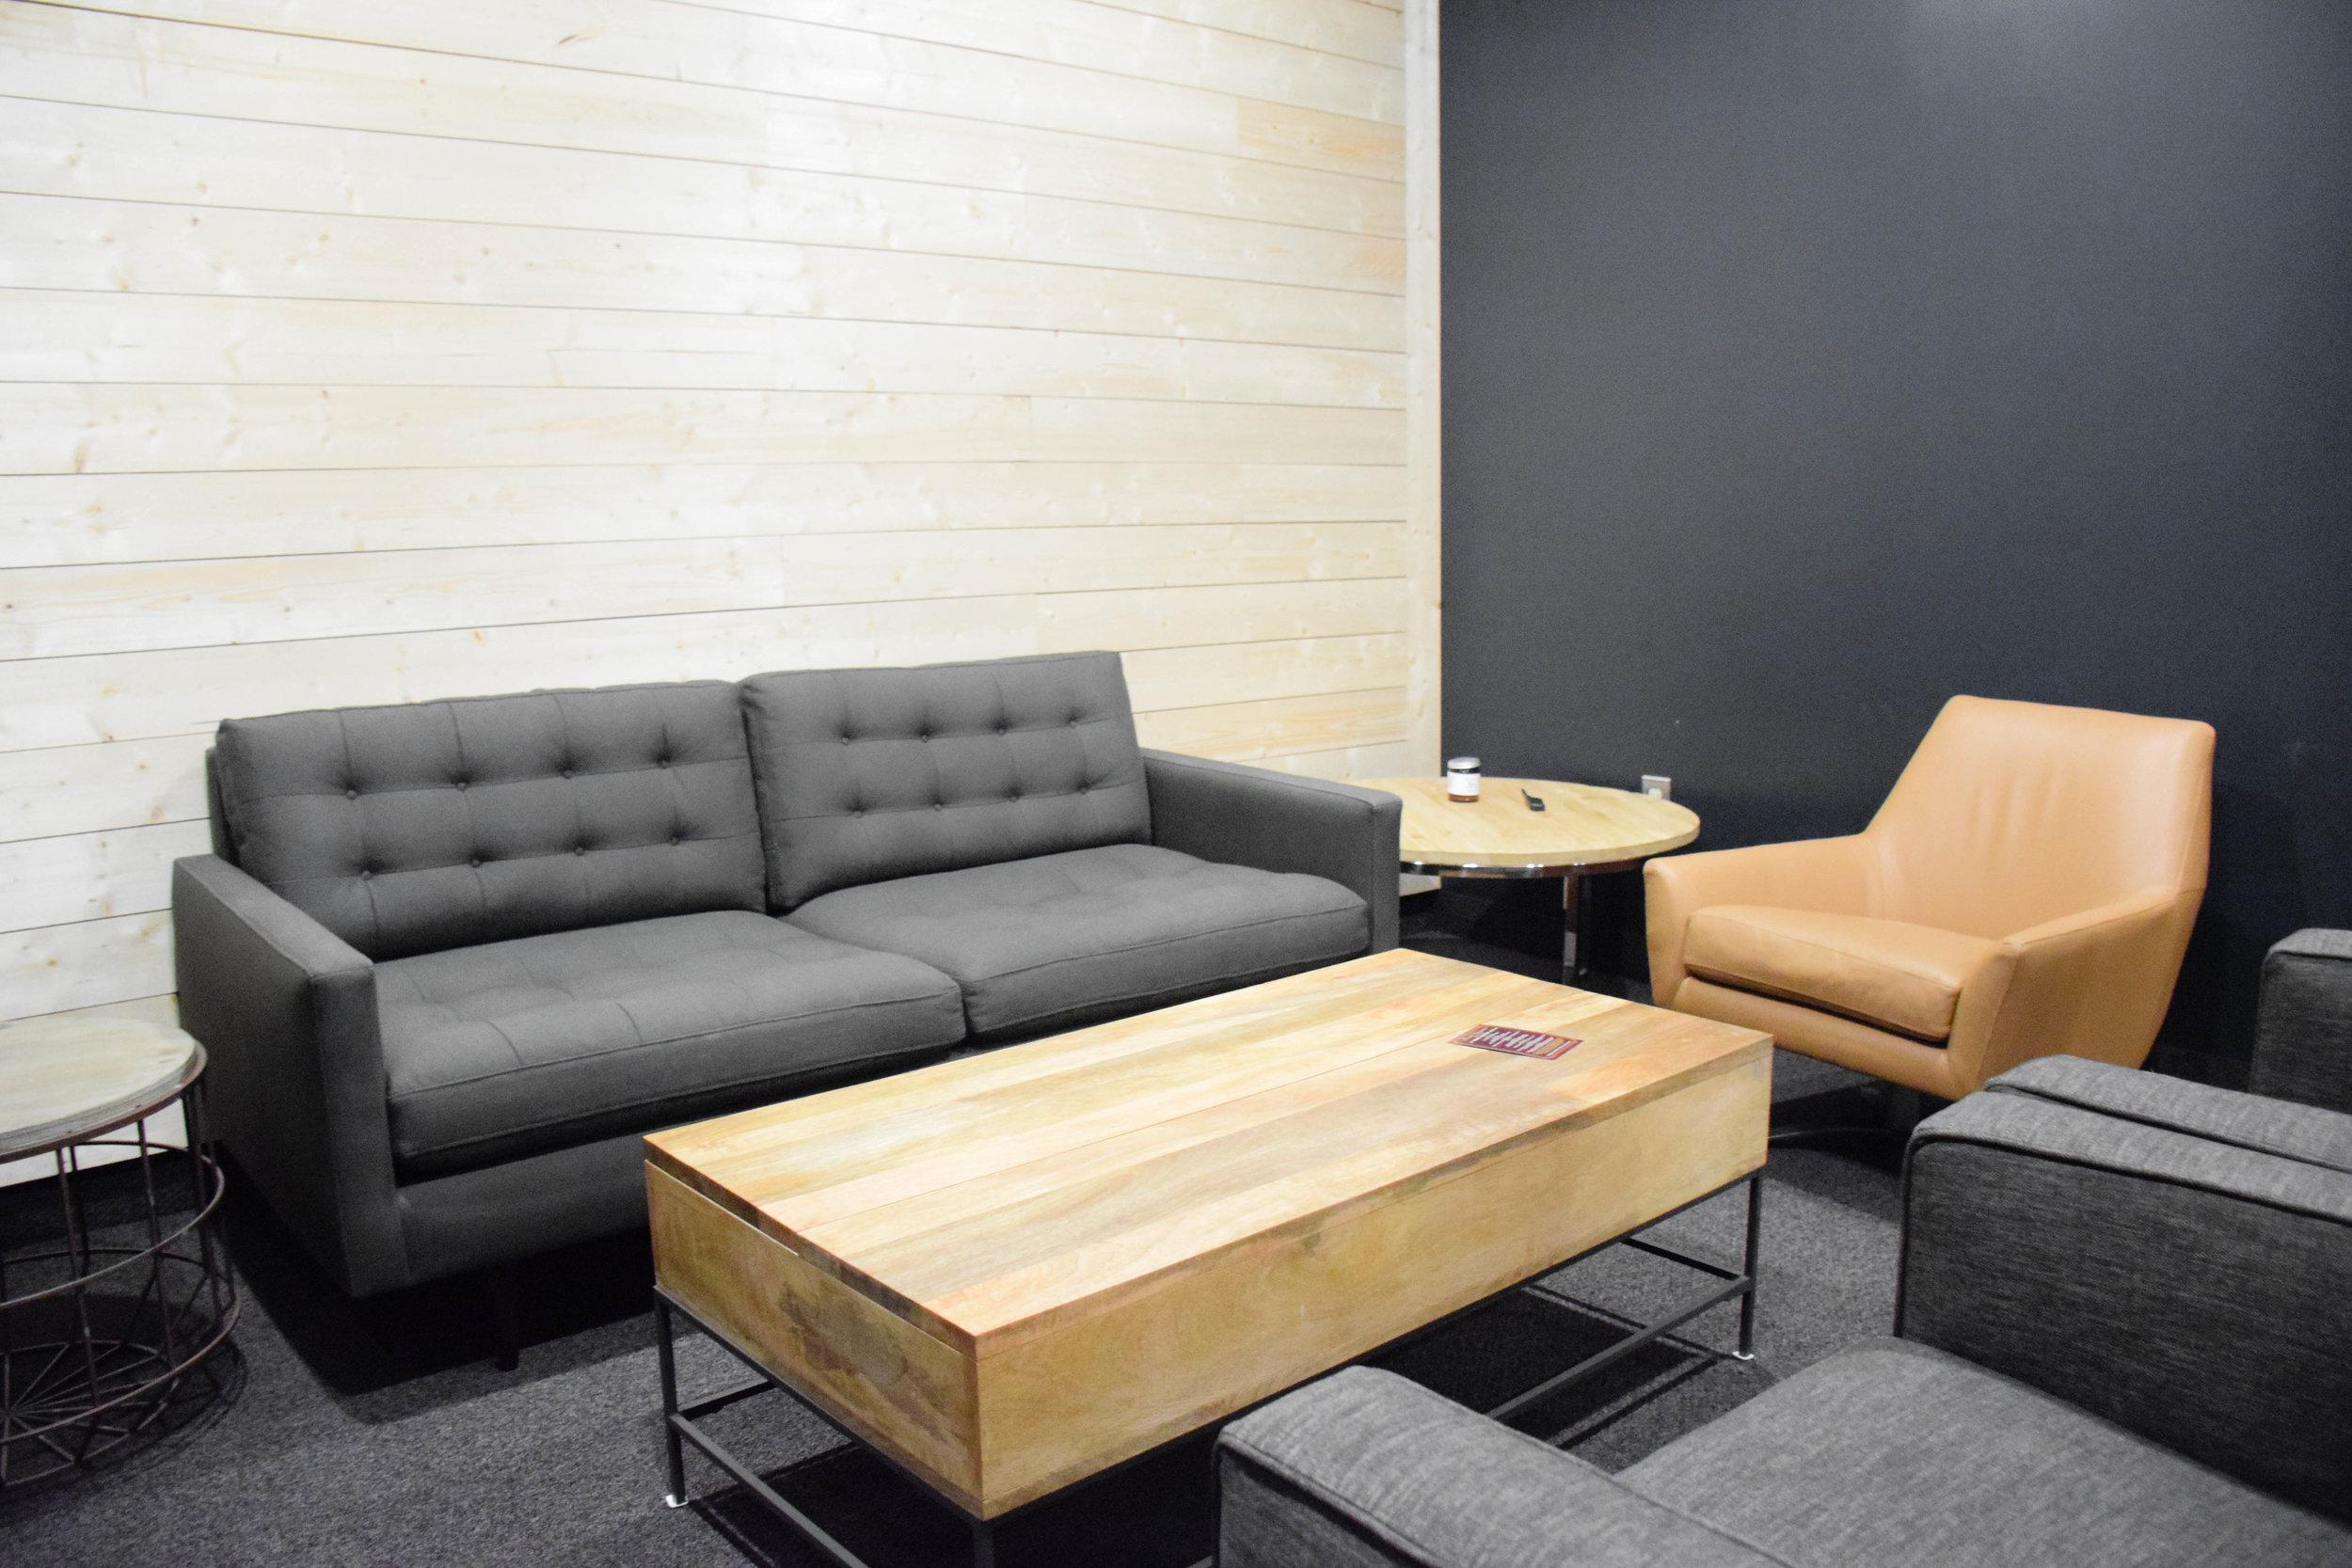 industrial workspace design | pelaia media group-0748-2.jpg